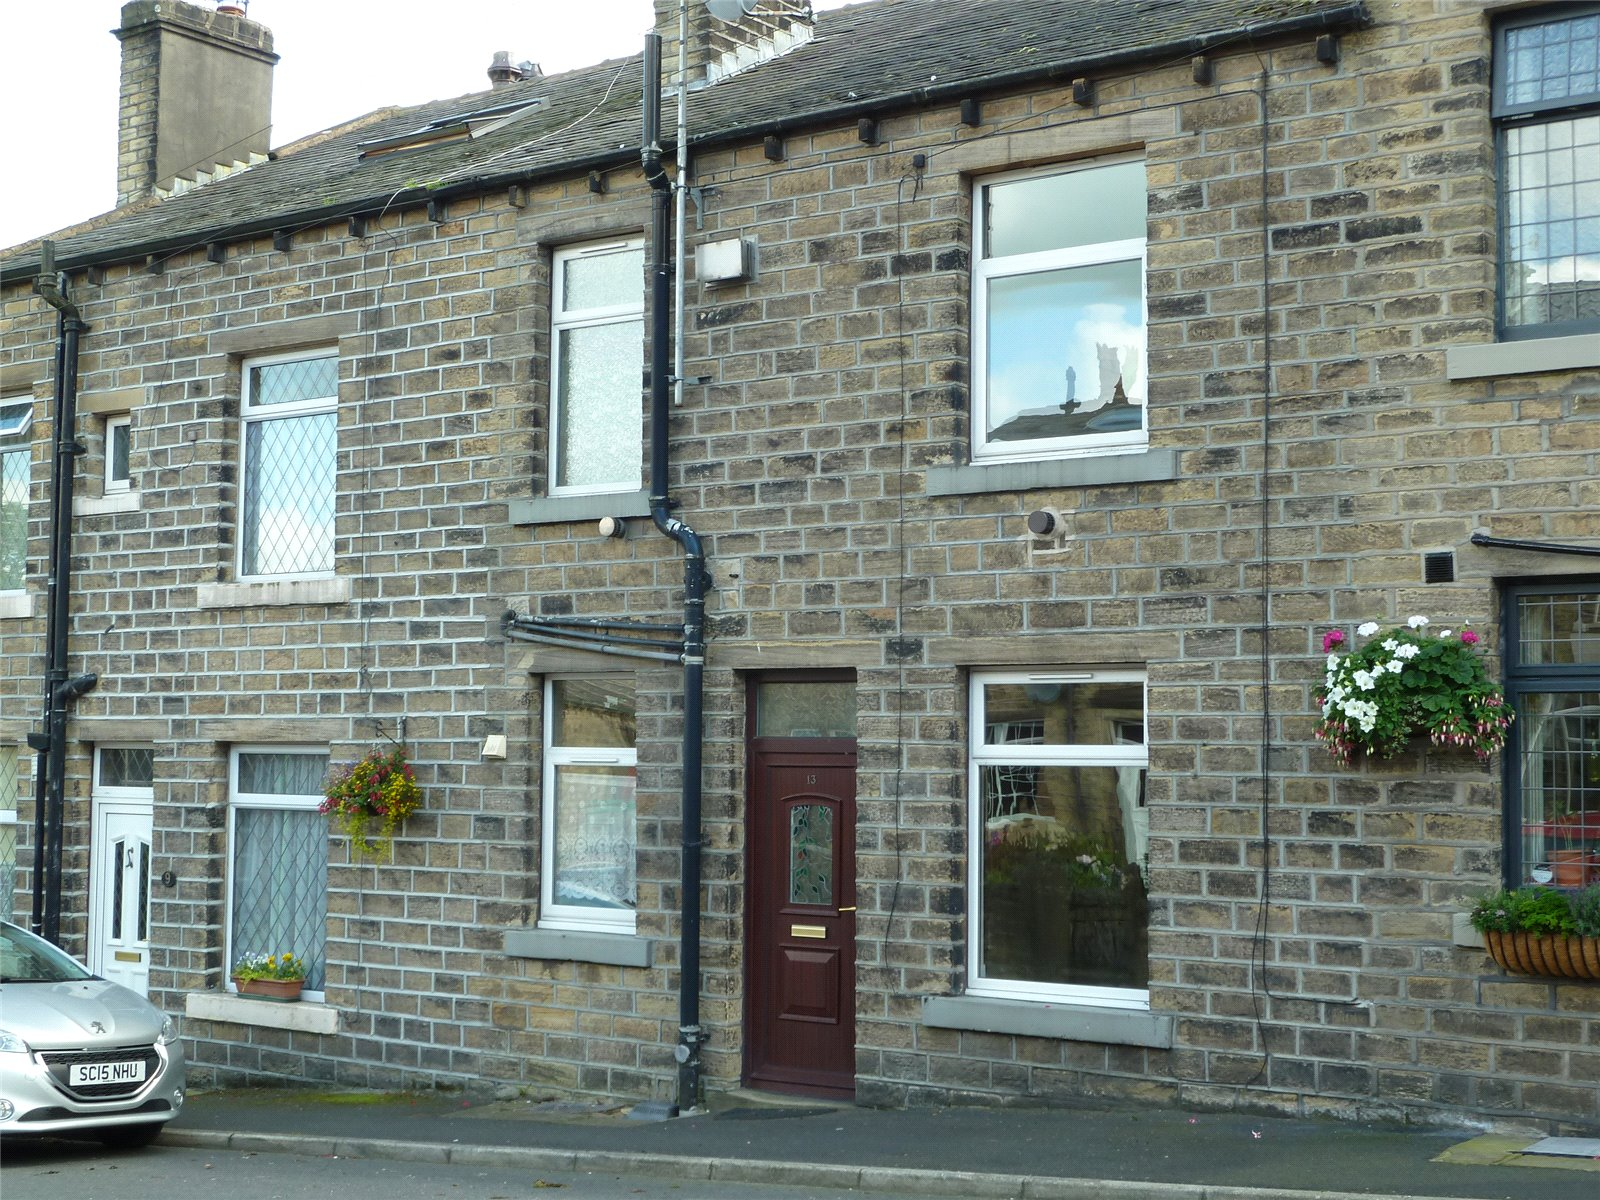 1 Bedroom House for sale in Mount Road, Marsden, Huddersfield, West Yorkshire, HD7